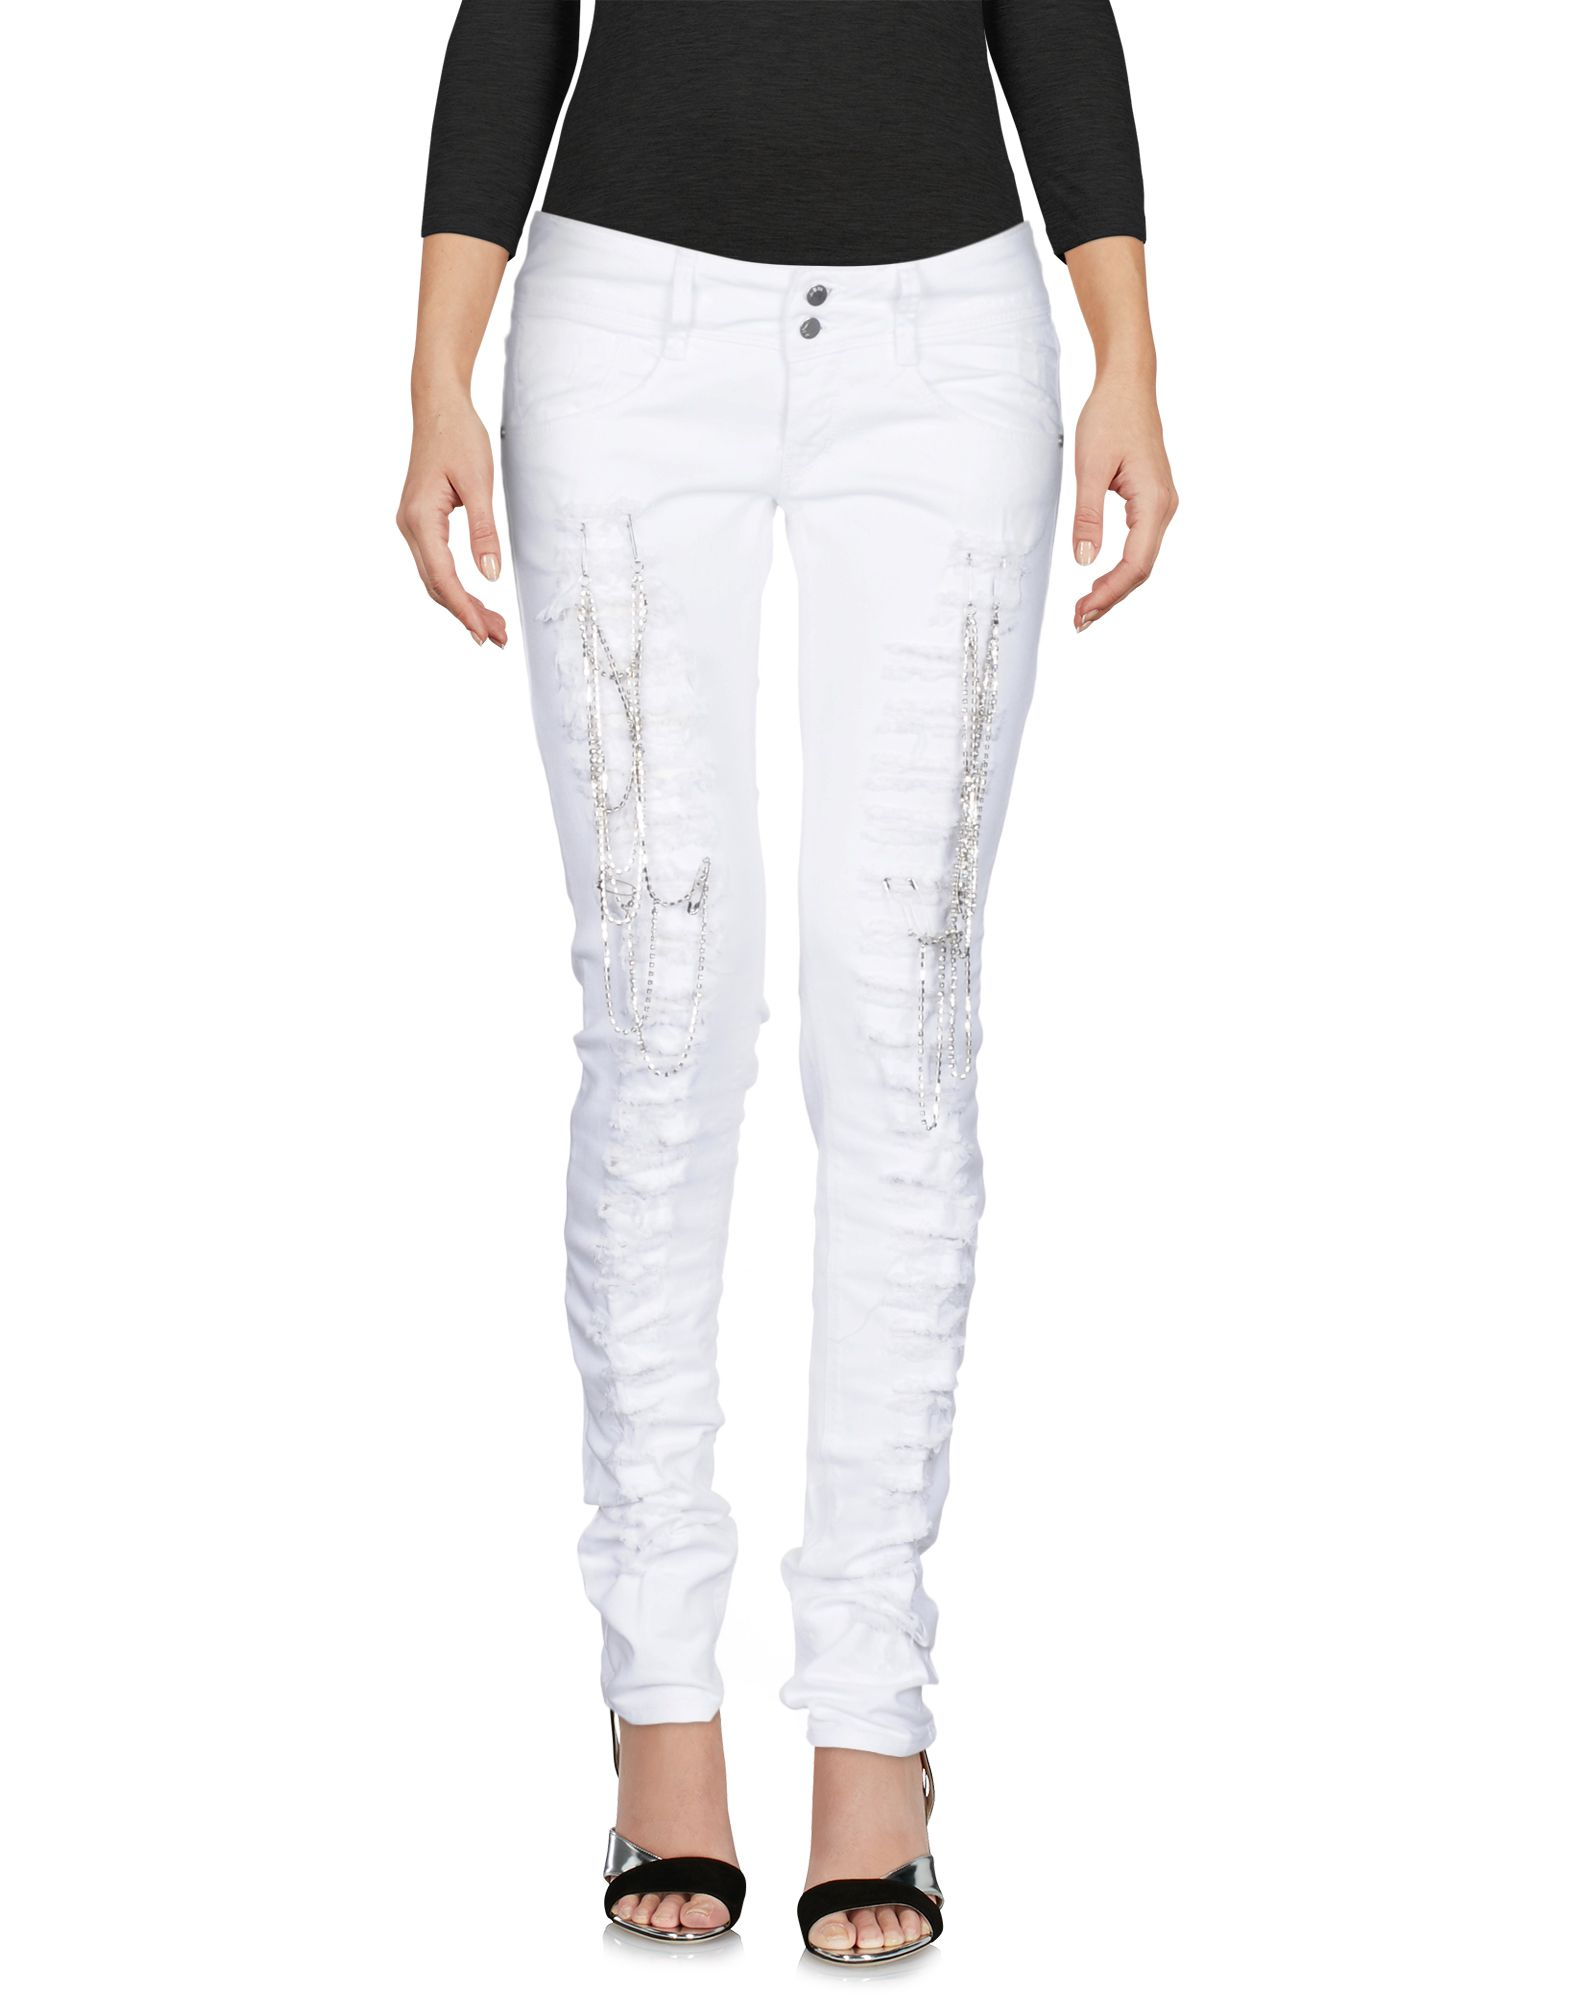 Pantaloni Jeans Met Donna - Acquista online su ODEUNJbR